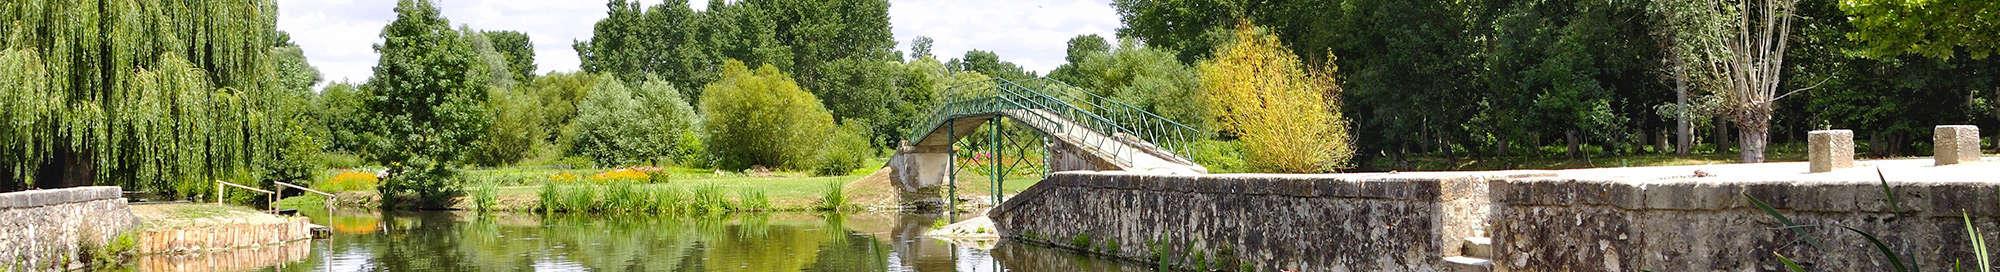 Escapadas fin de semana en Deux-Sèvres